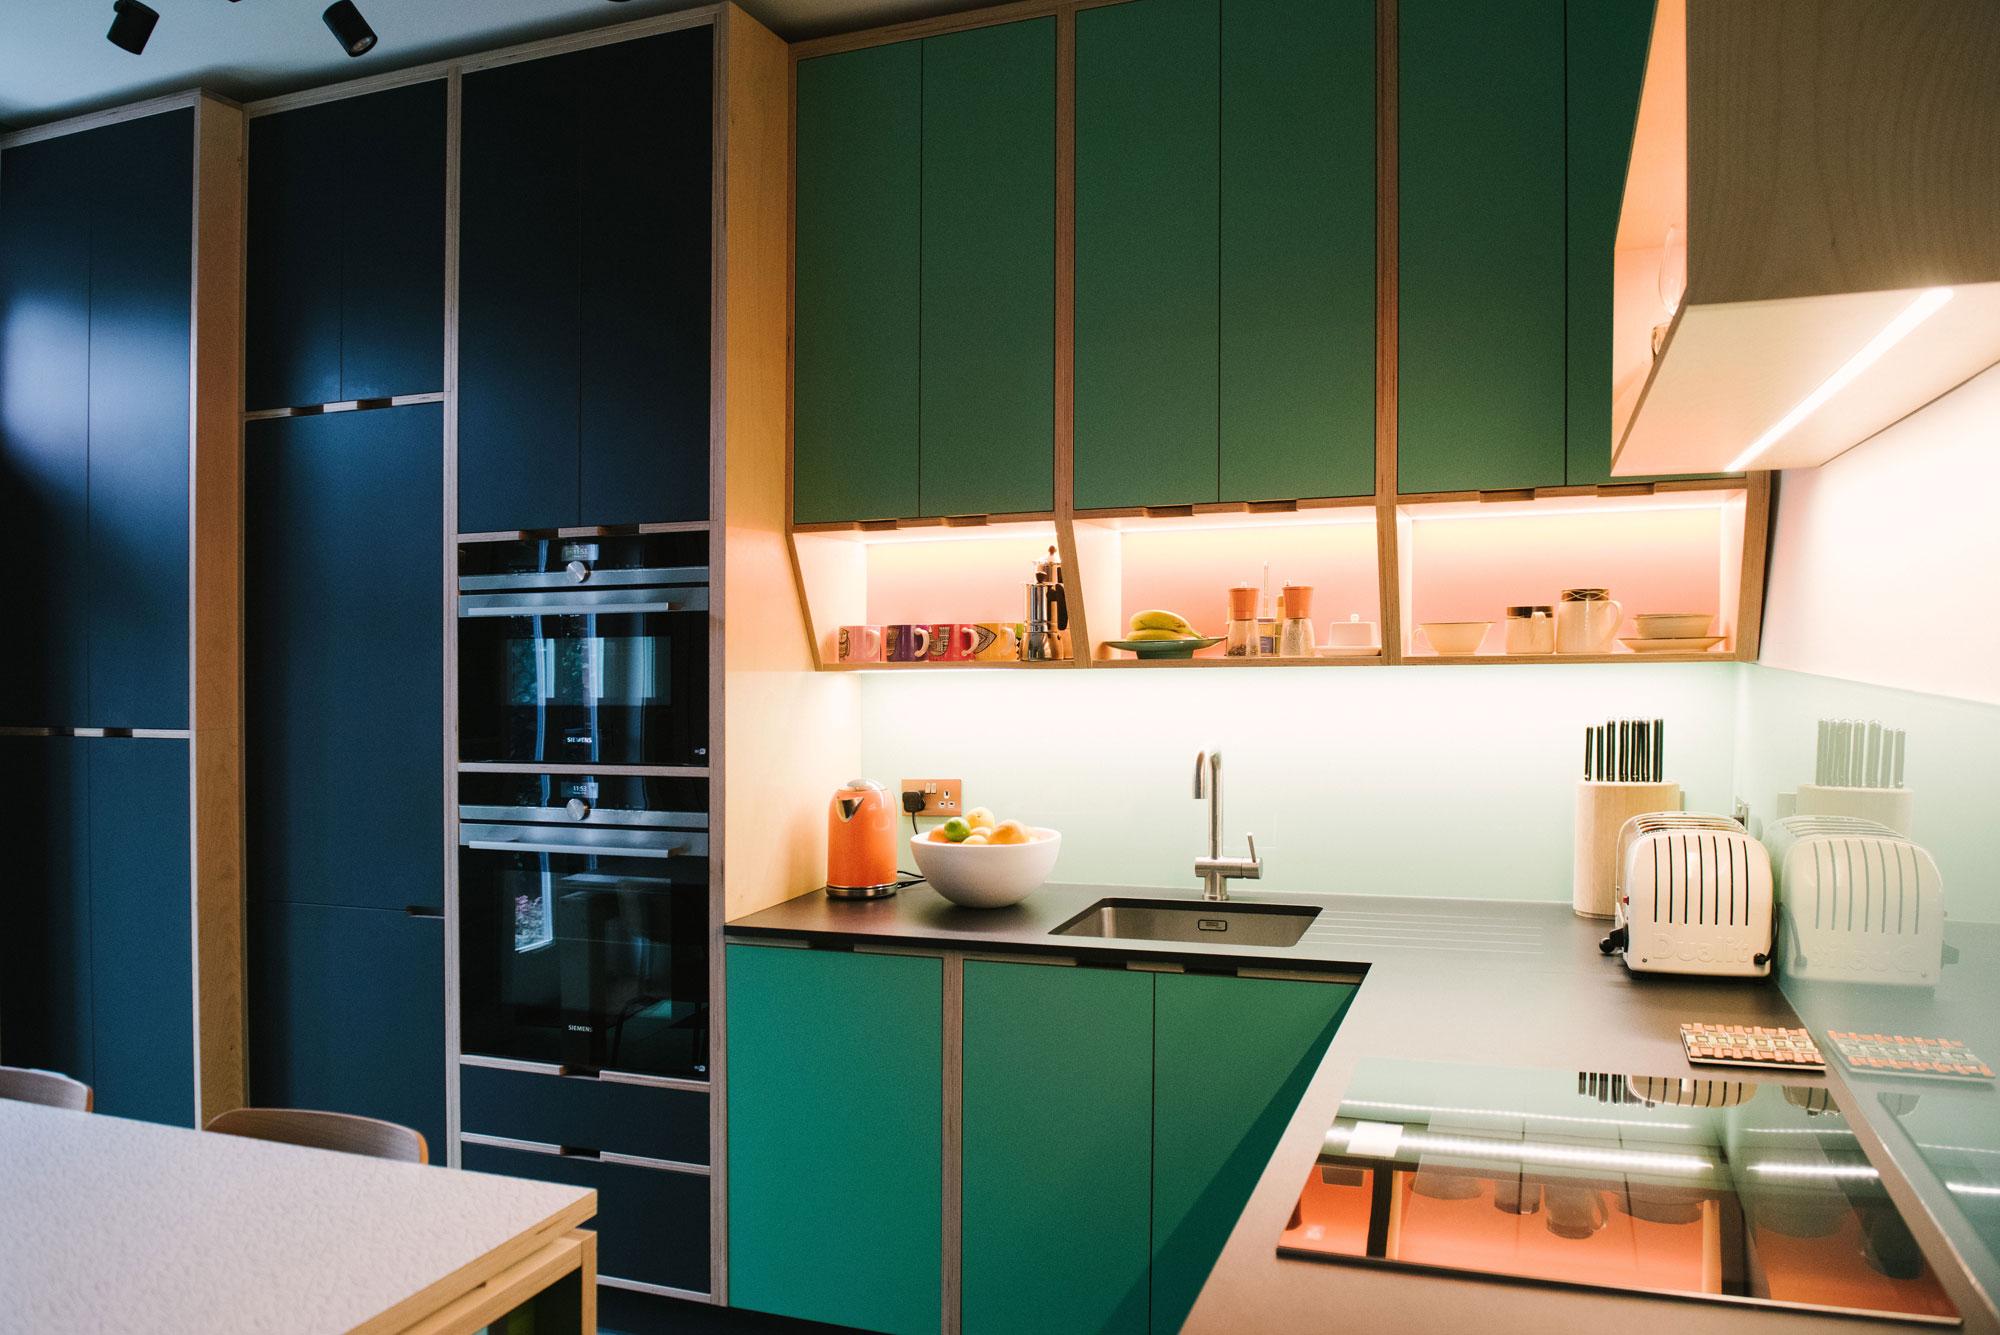 70's Style plywood kitchen